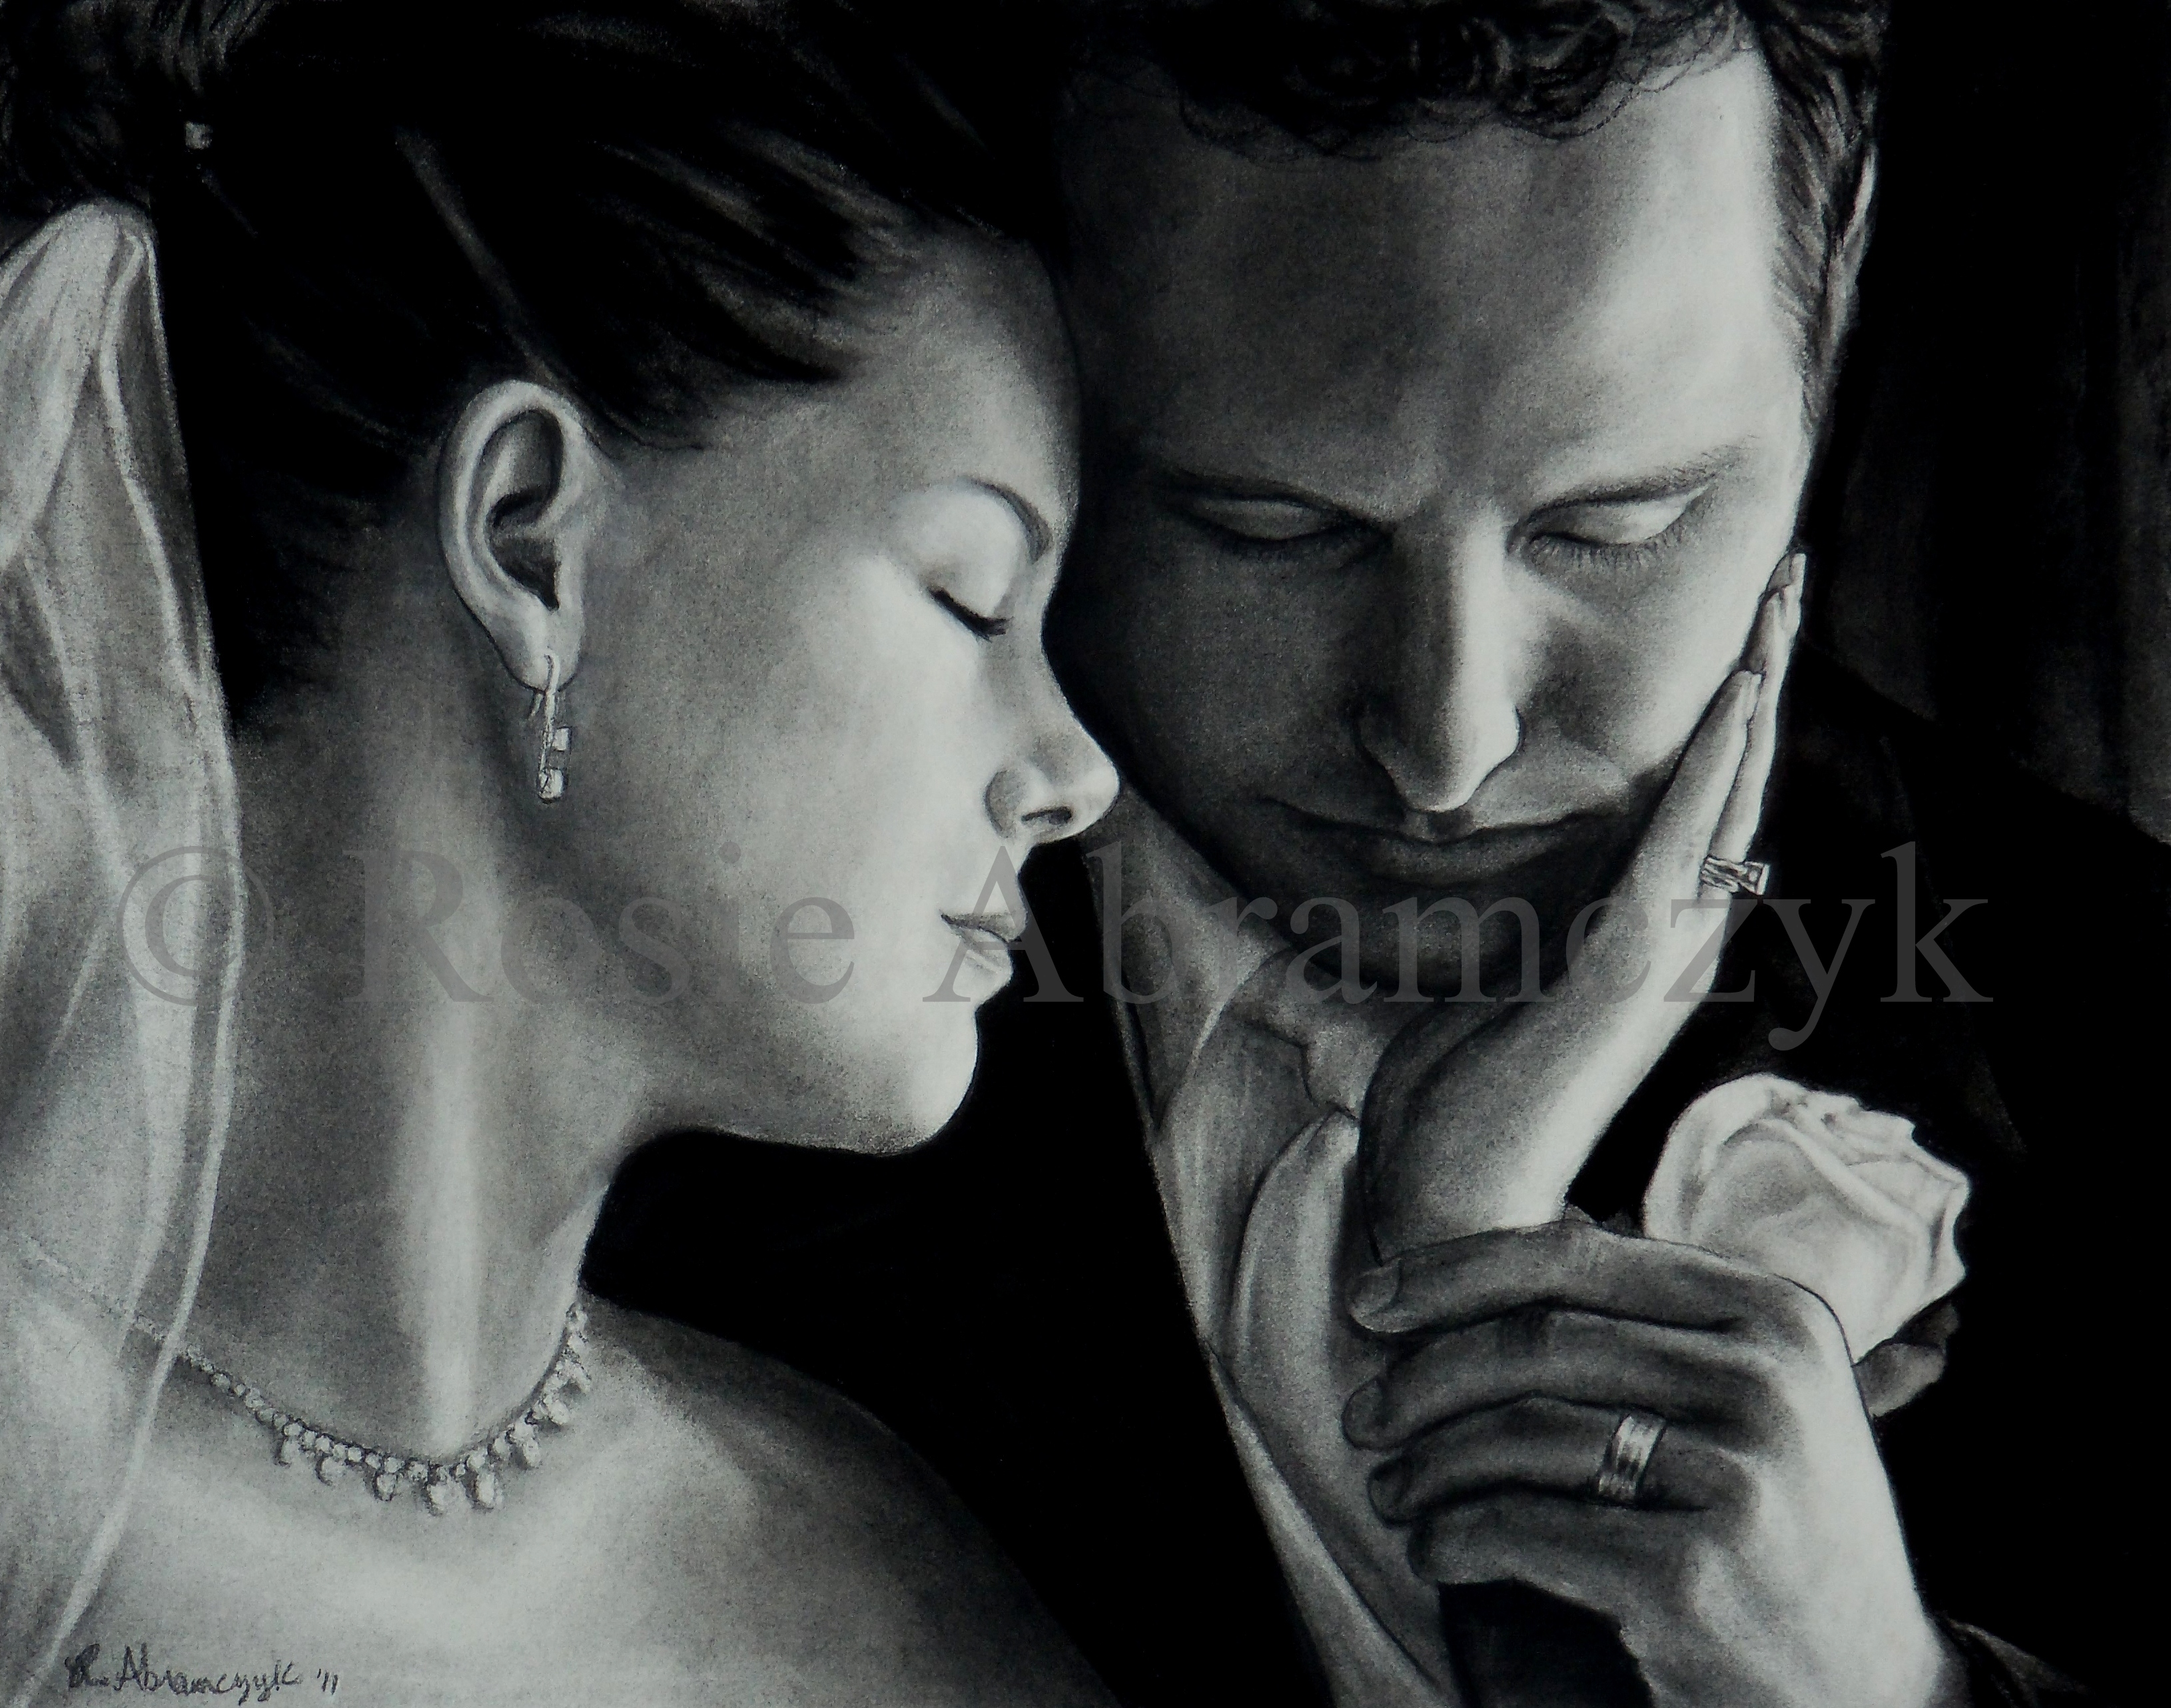 Tricia & Matt, by Rosie Abramczyk, Charcoal, 2011